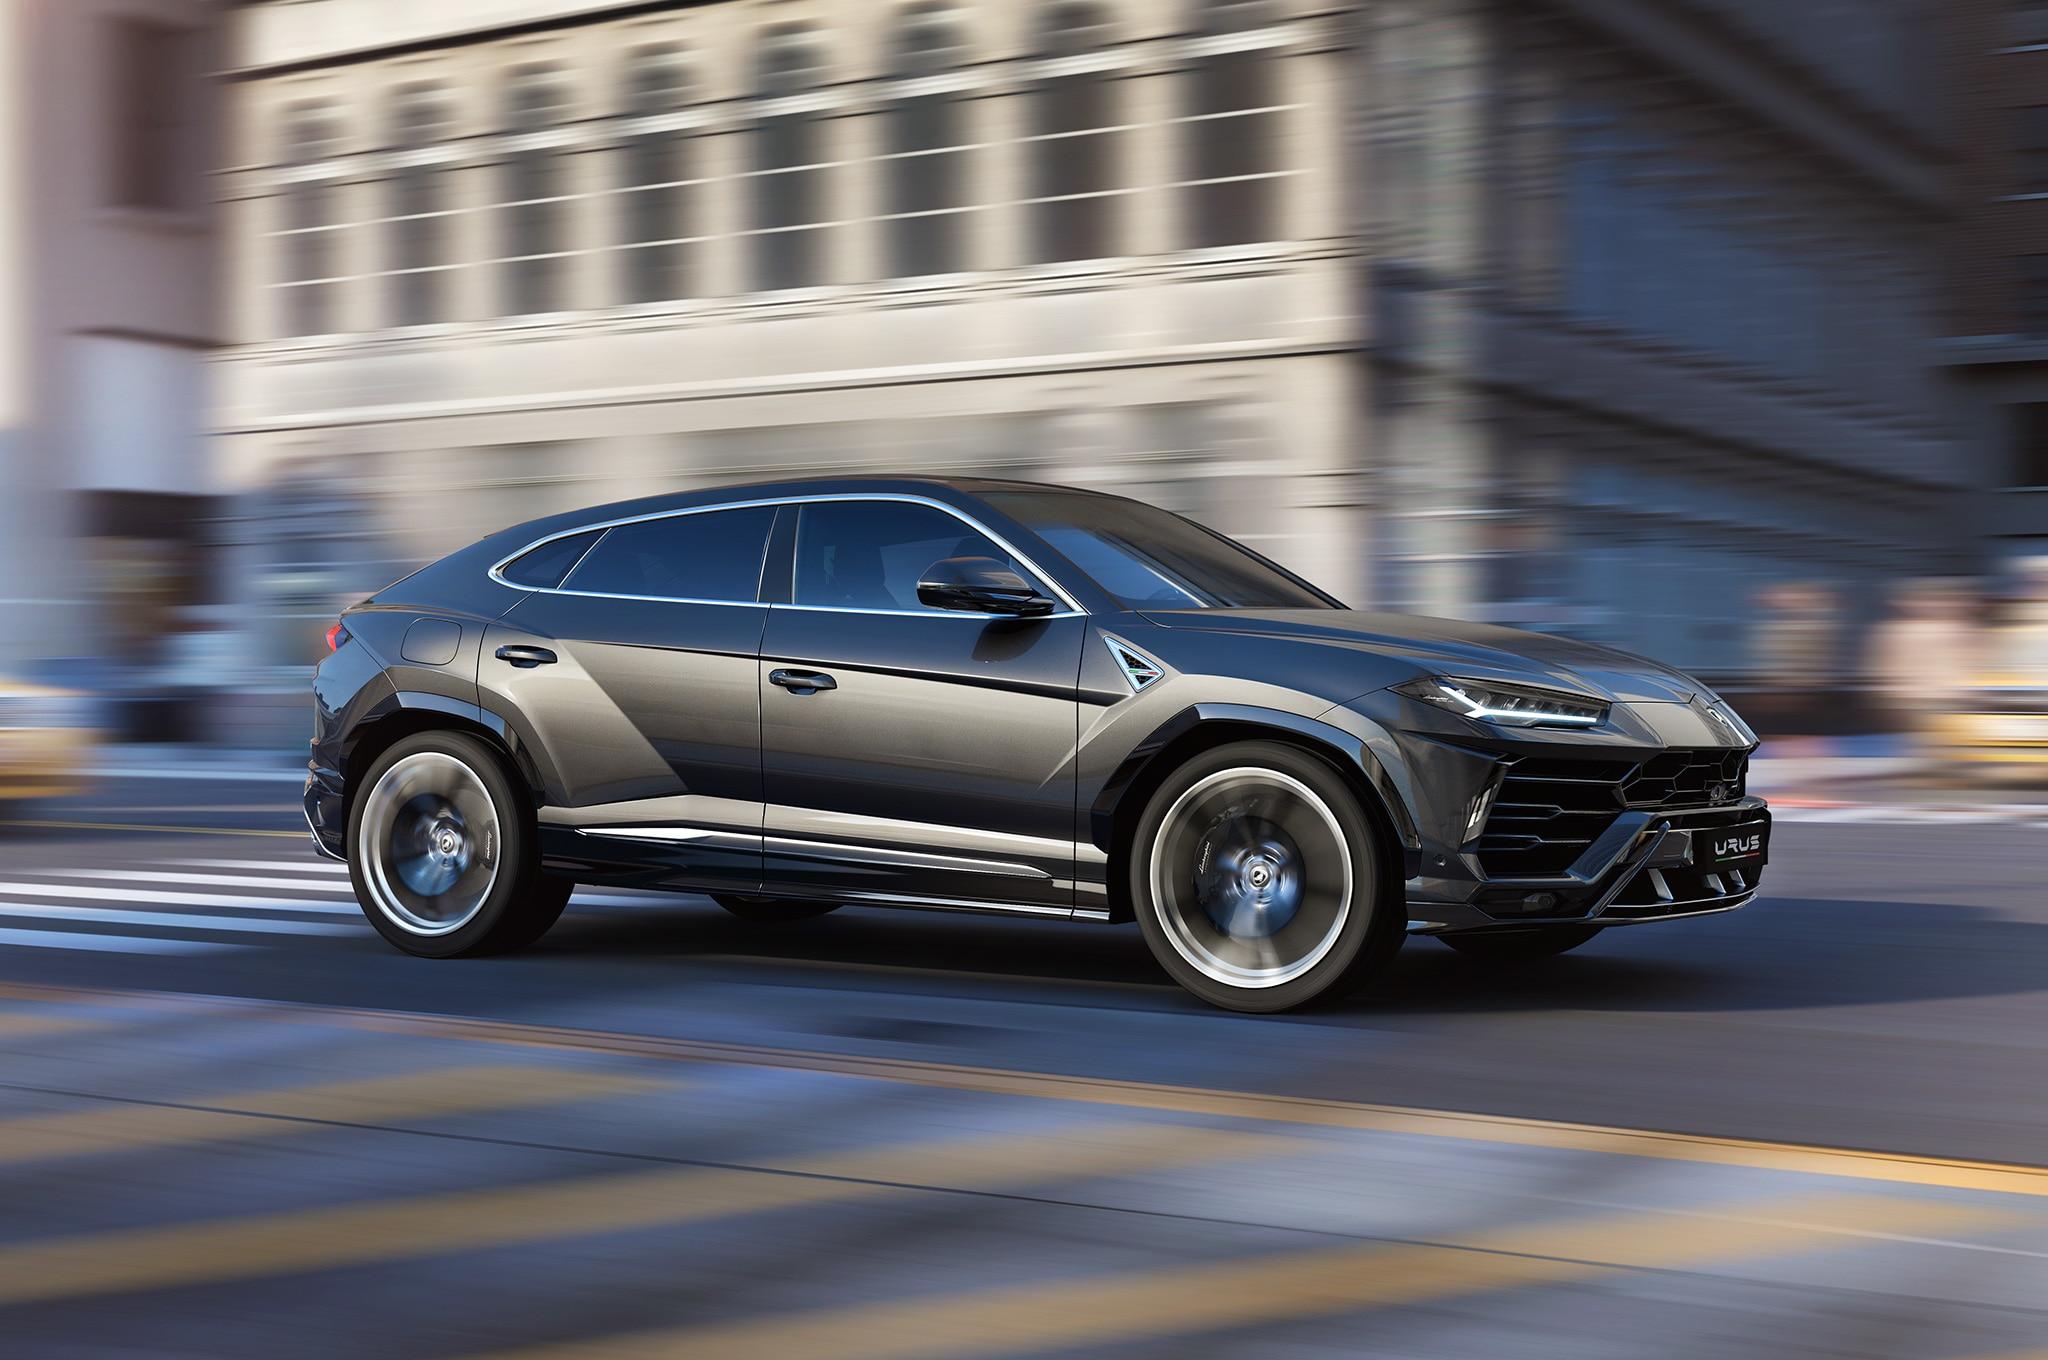 2019-Lamborghini-Urus-side-motion-view.jpg